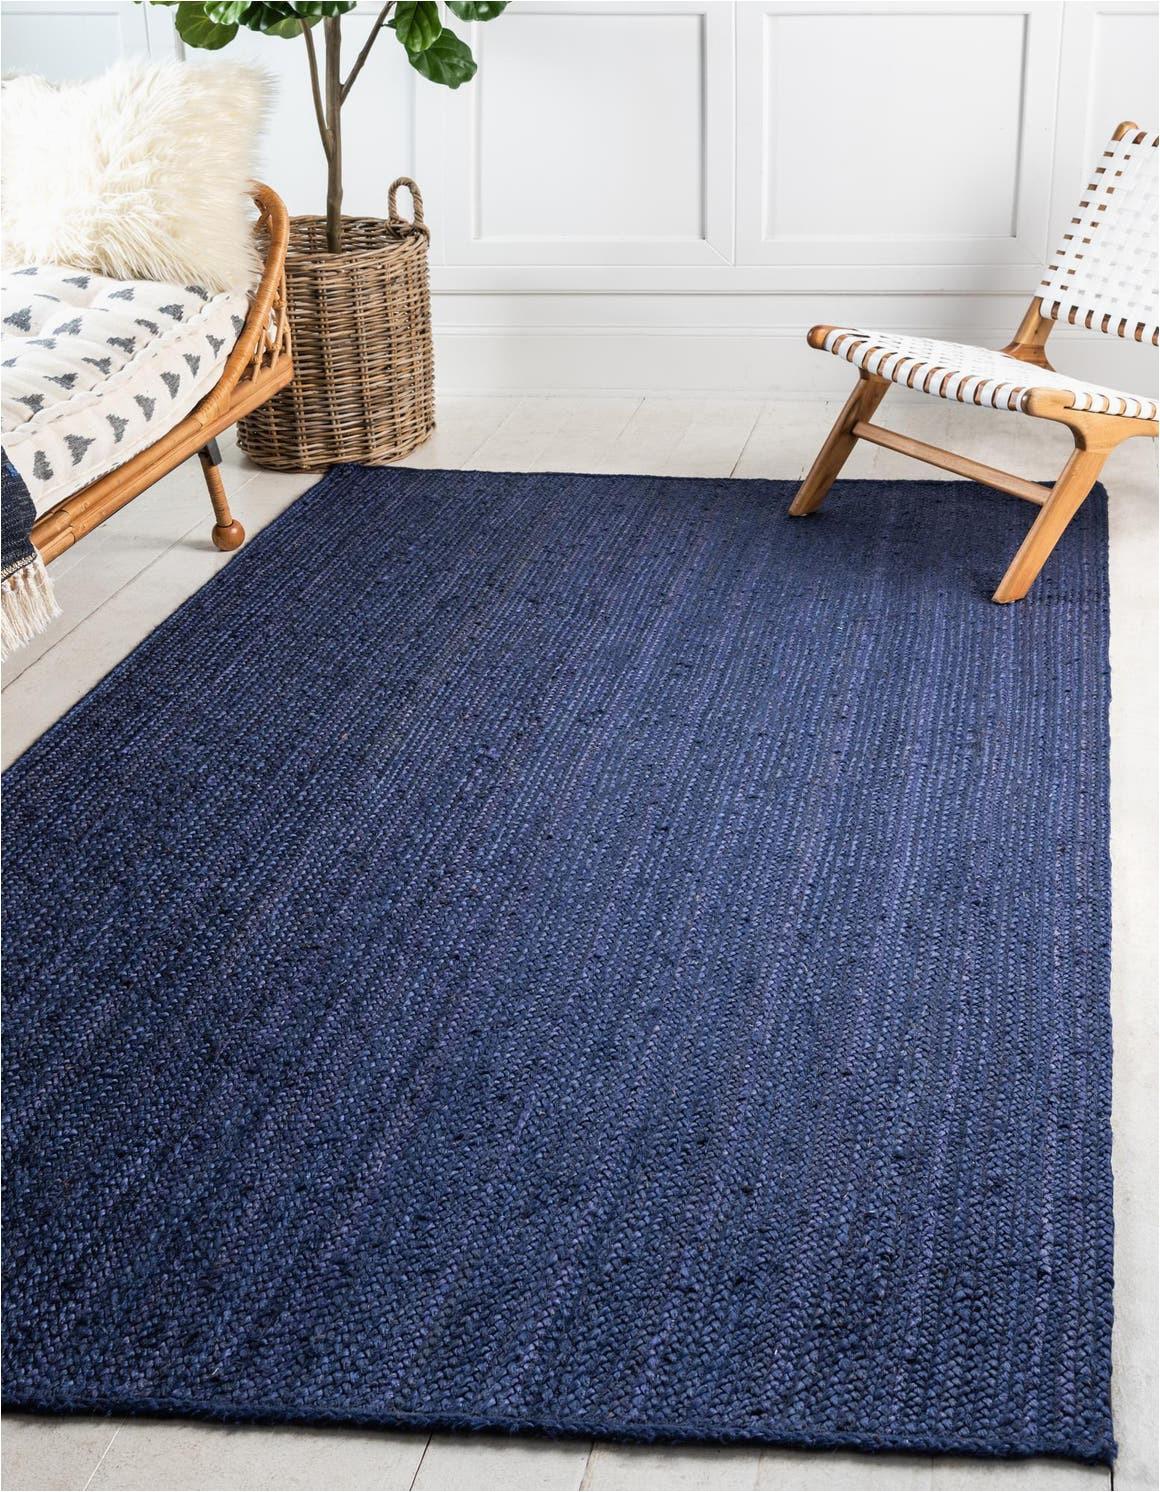 navy blue 8x10 braided jute area rug rt=bbsize